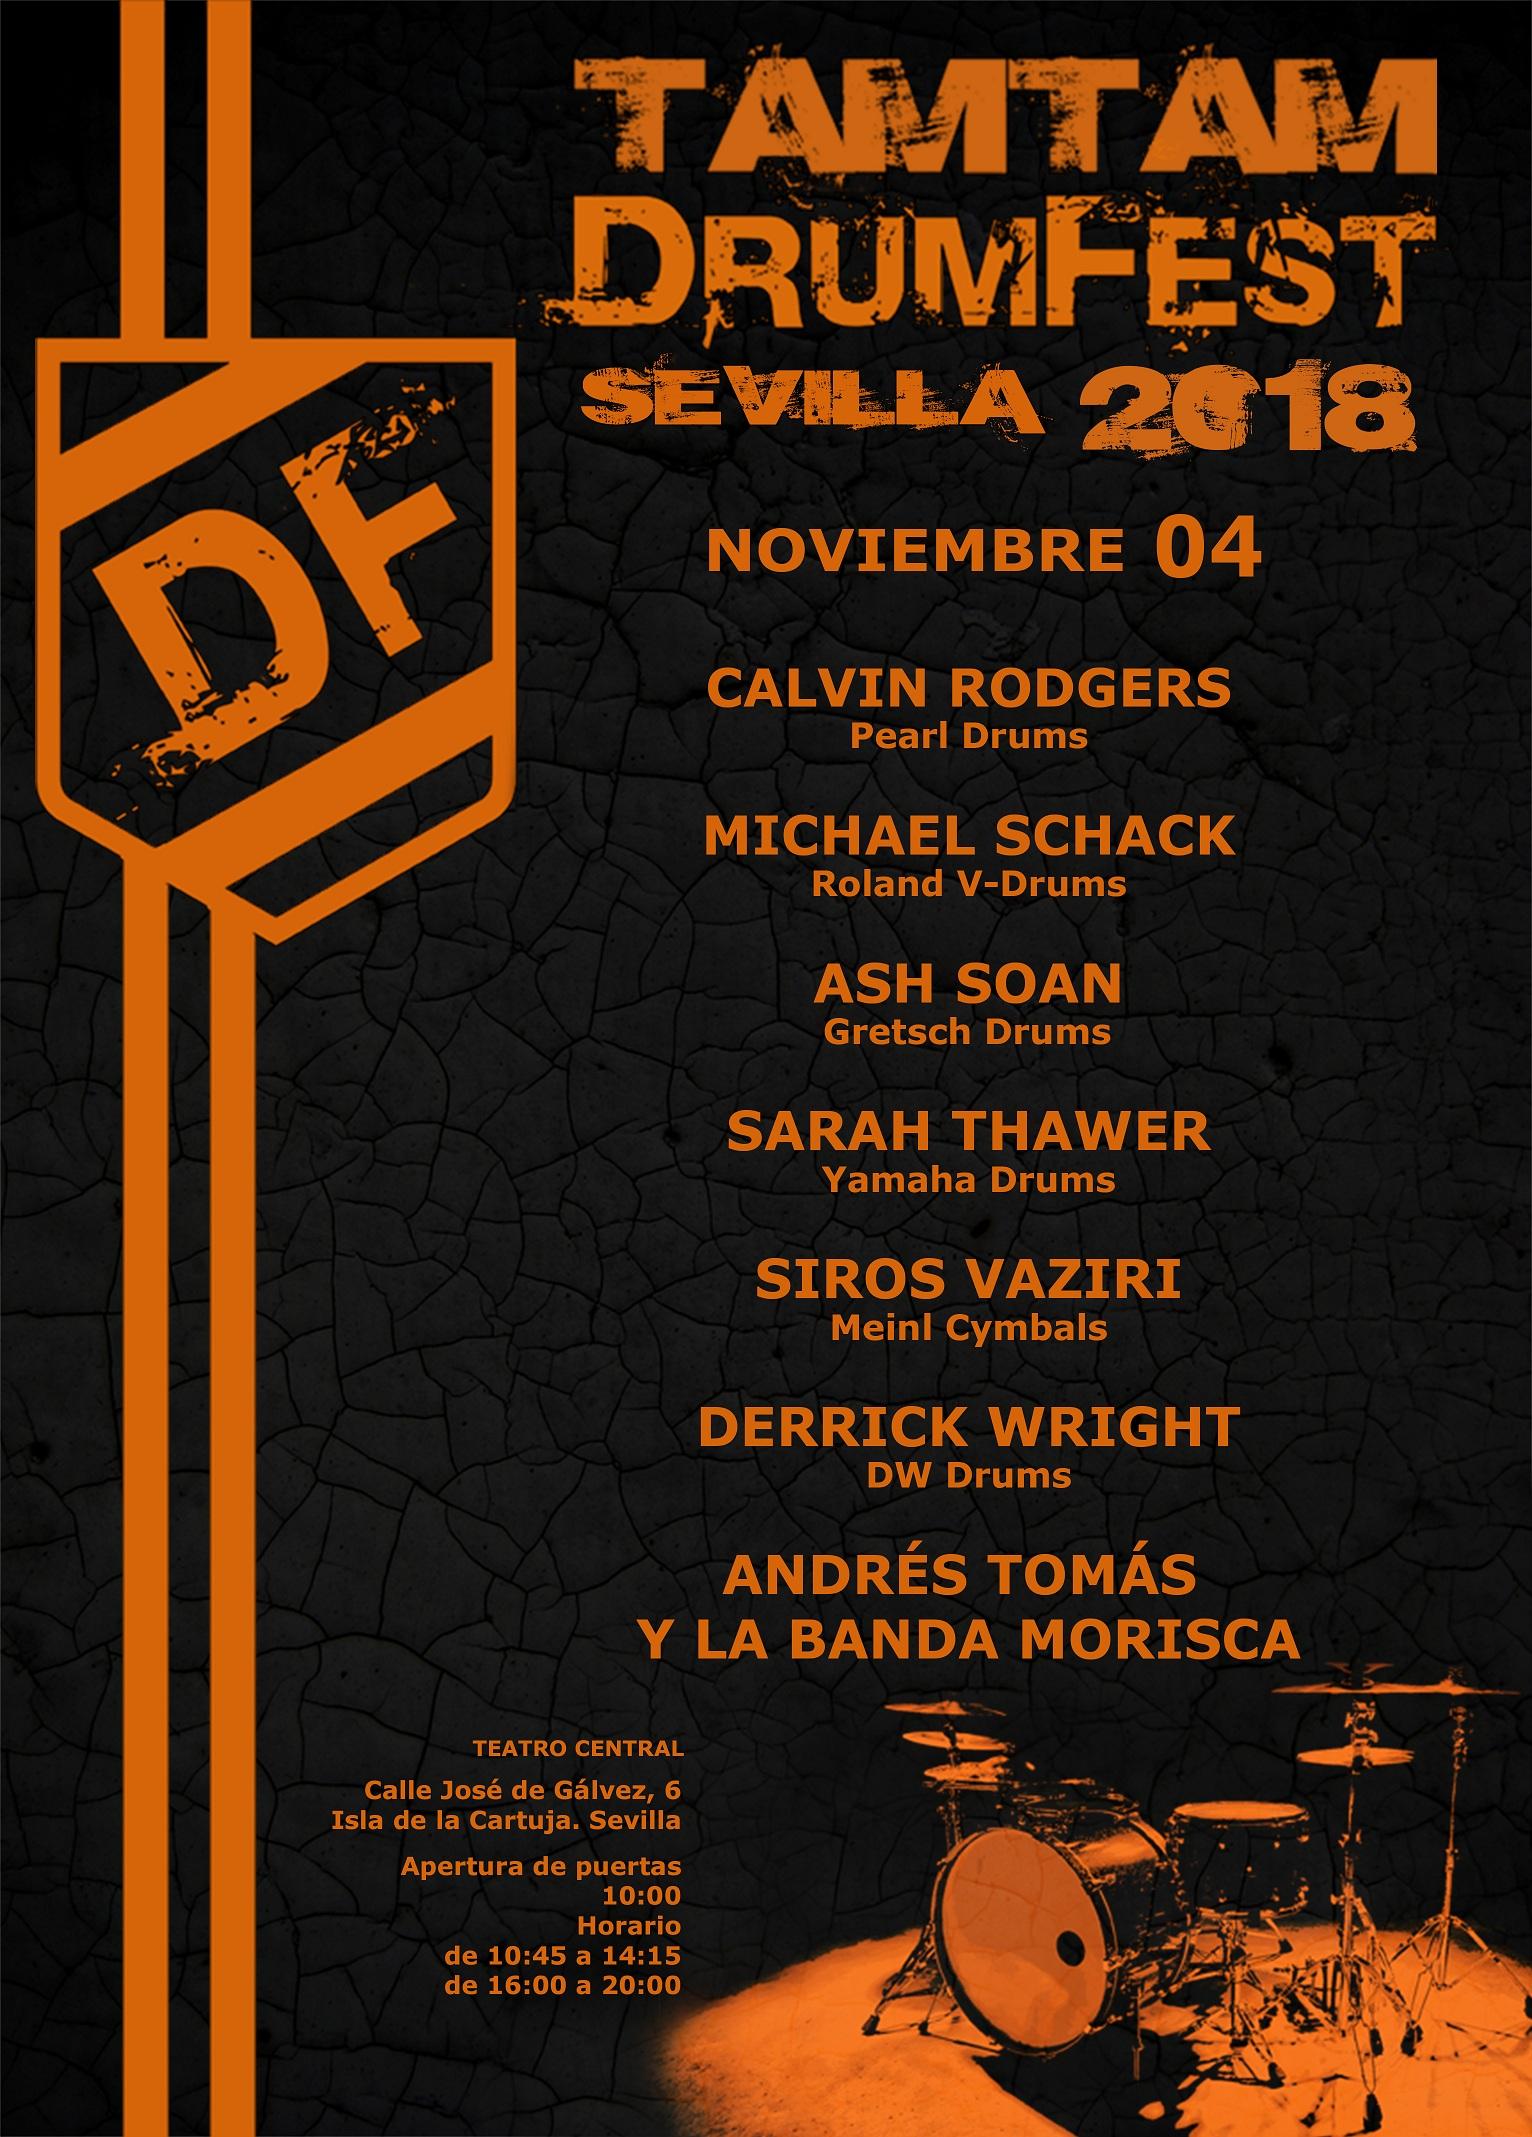 TamTam DrumFest Sevilla 2018